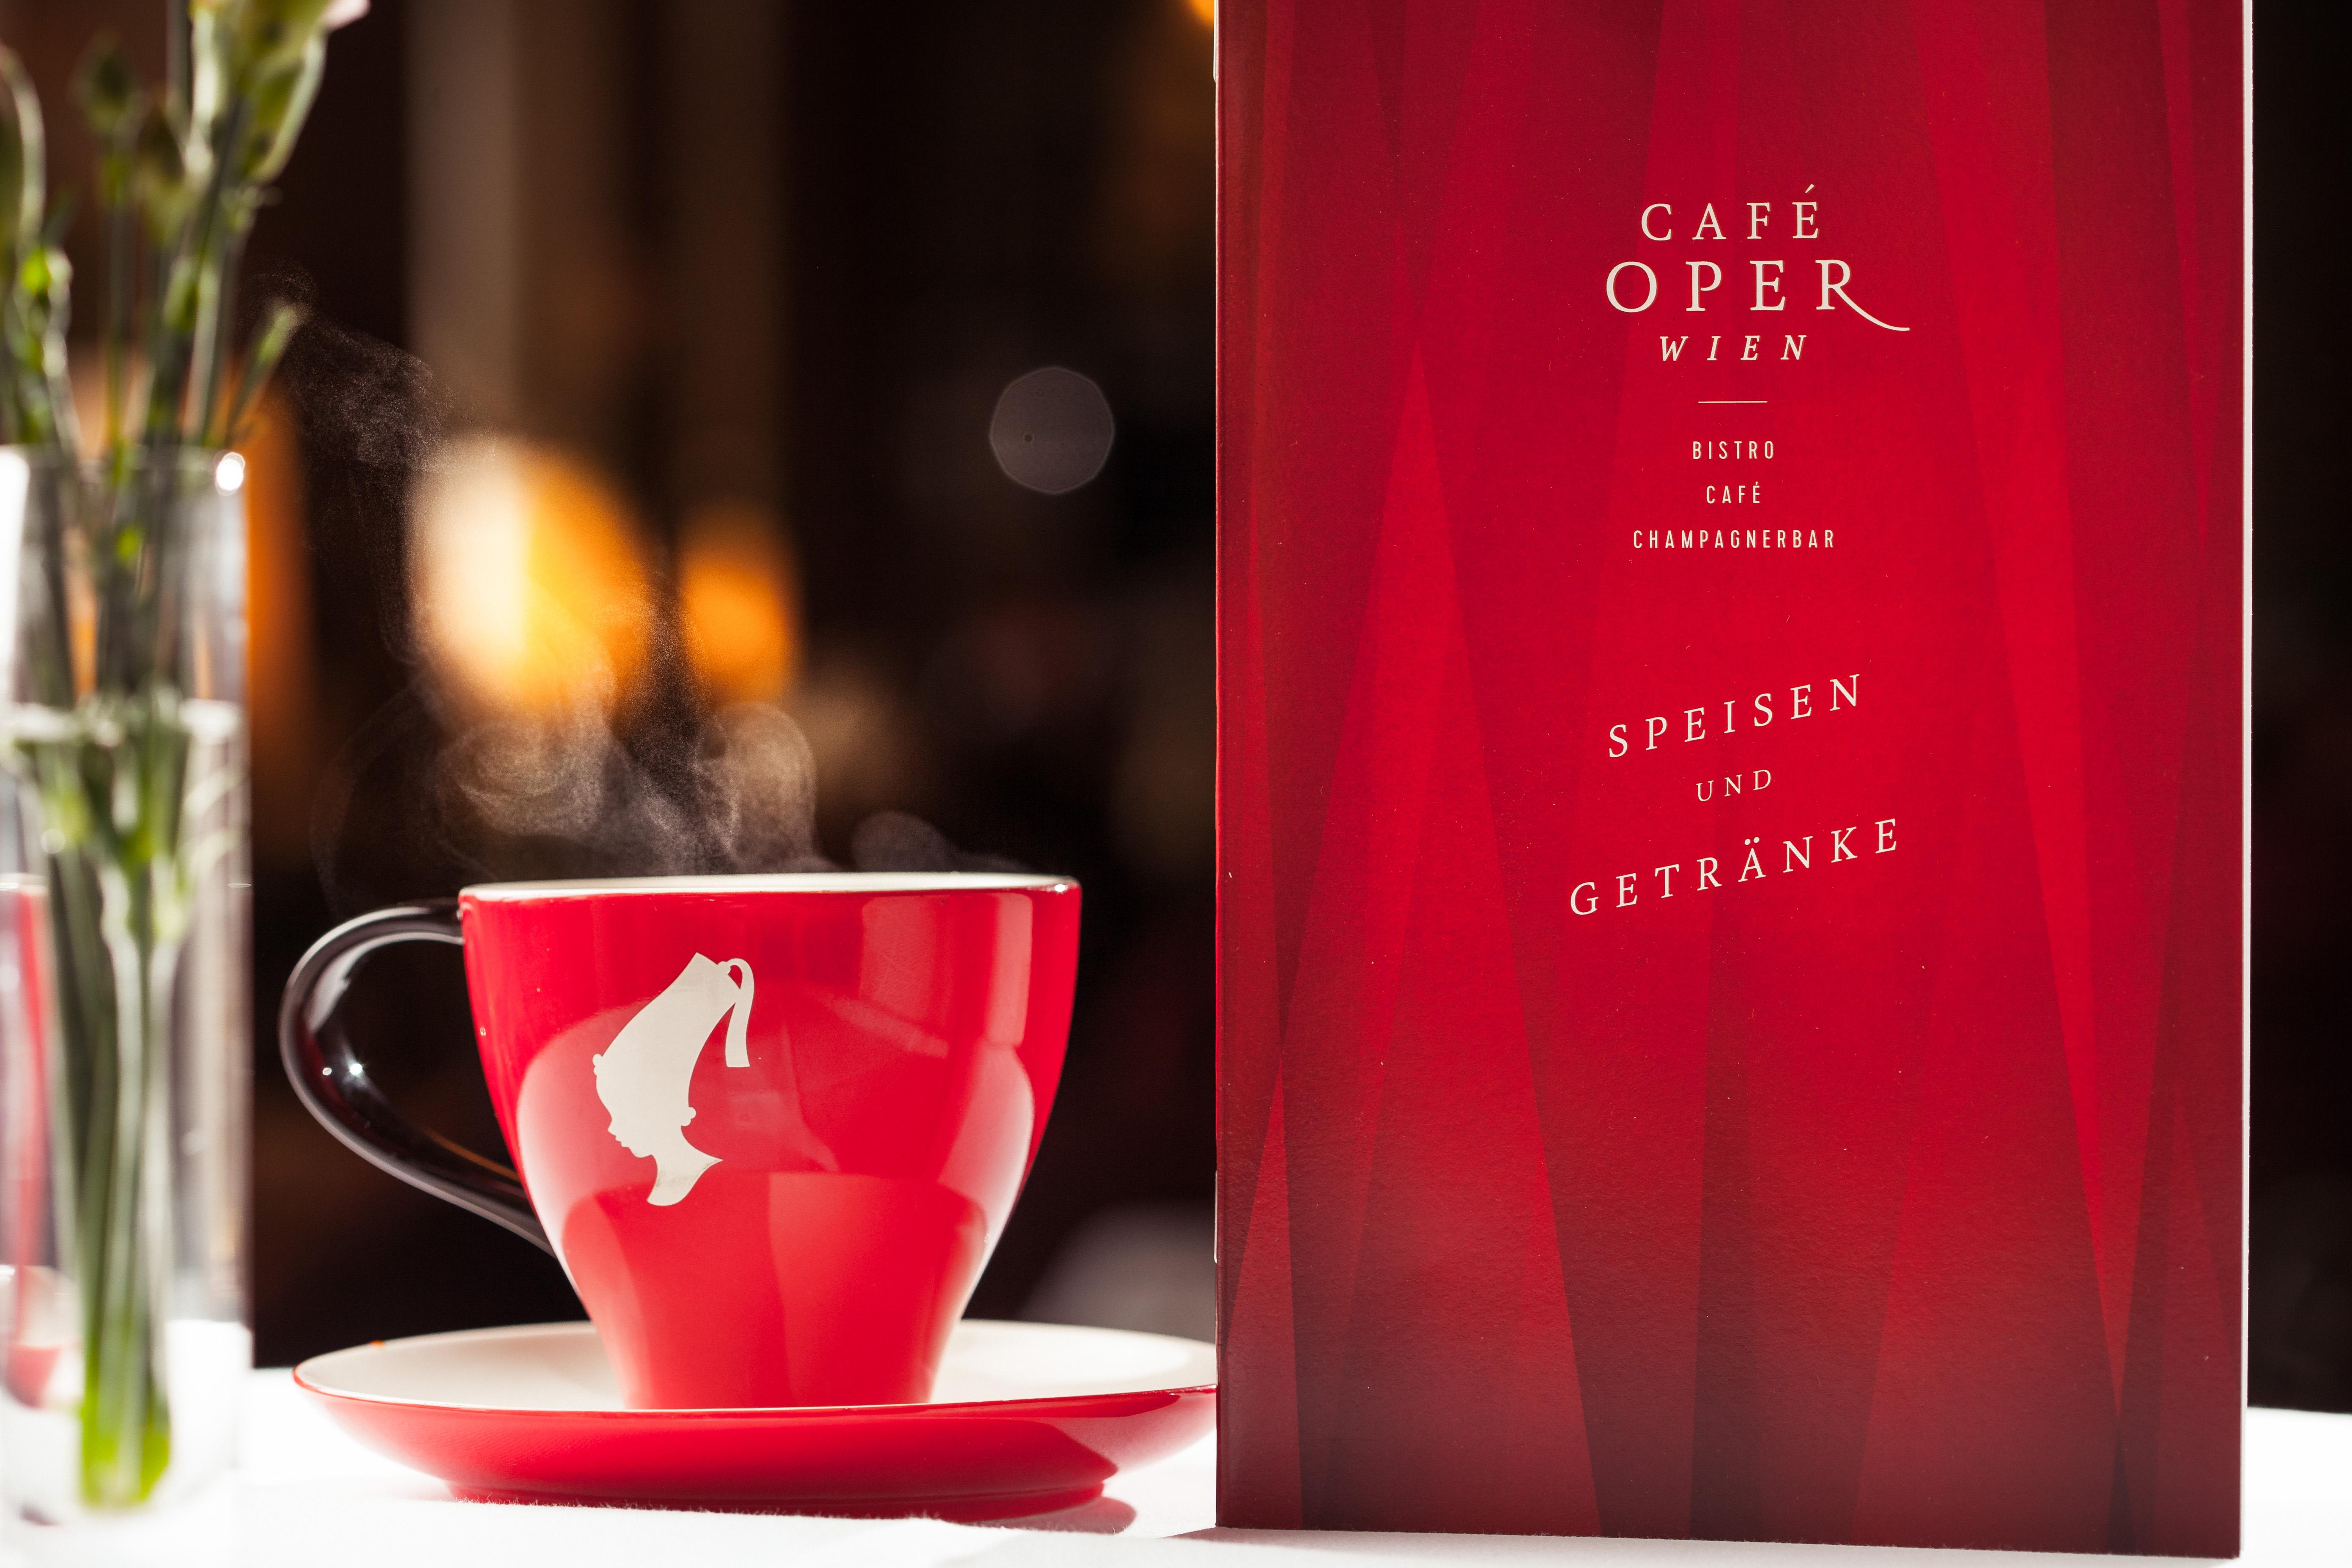 Meinl Premium Kaffee im Café Oper Wien